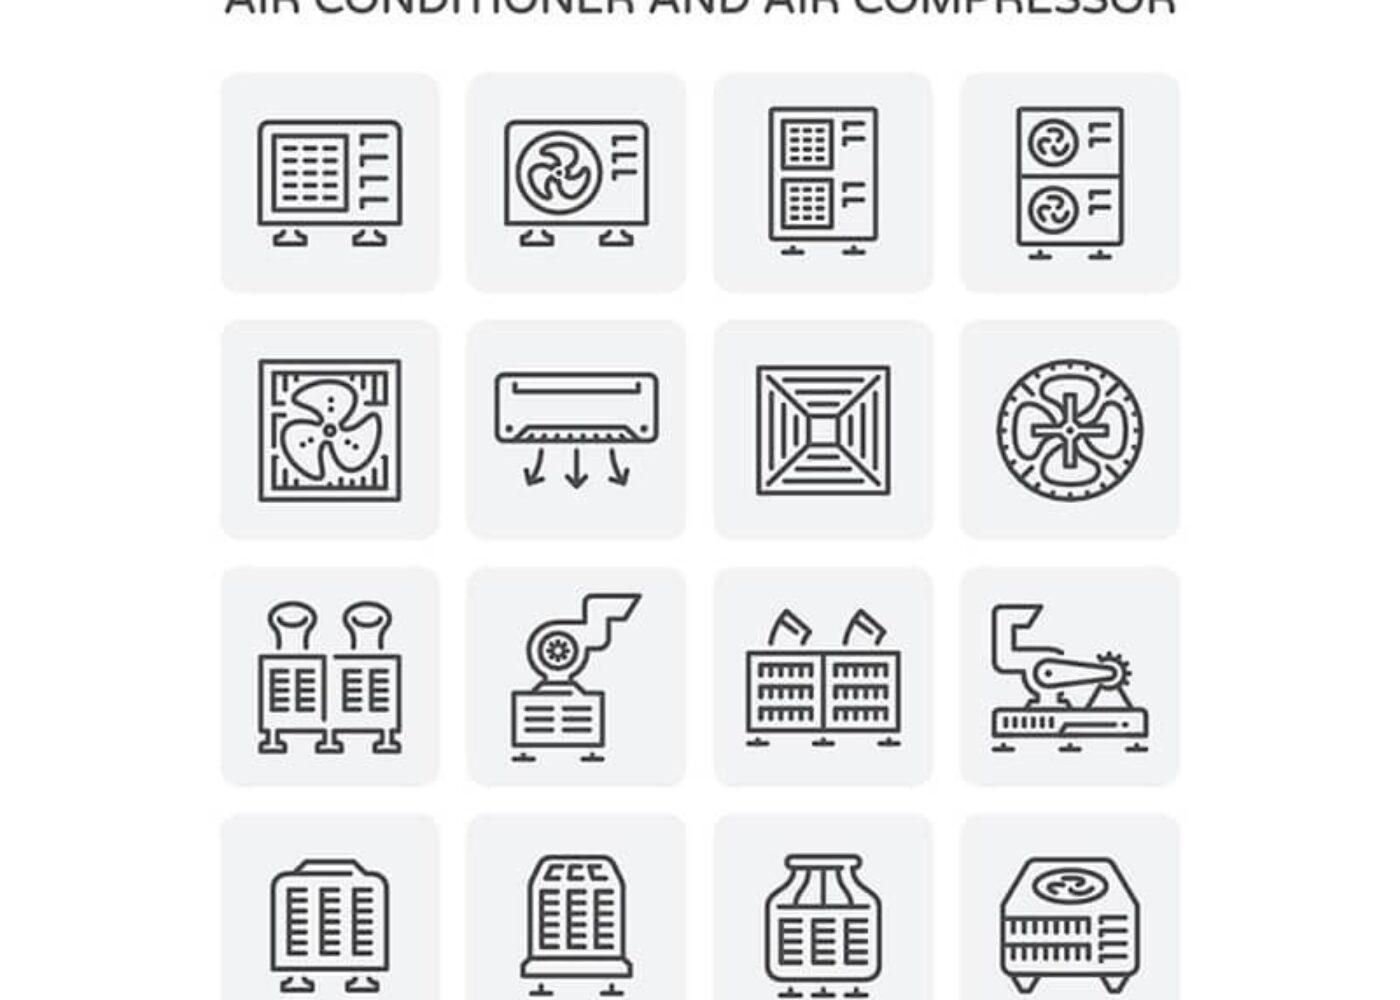 Types of AC unit